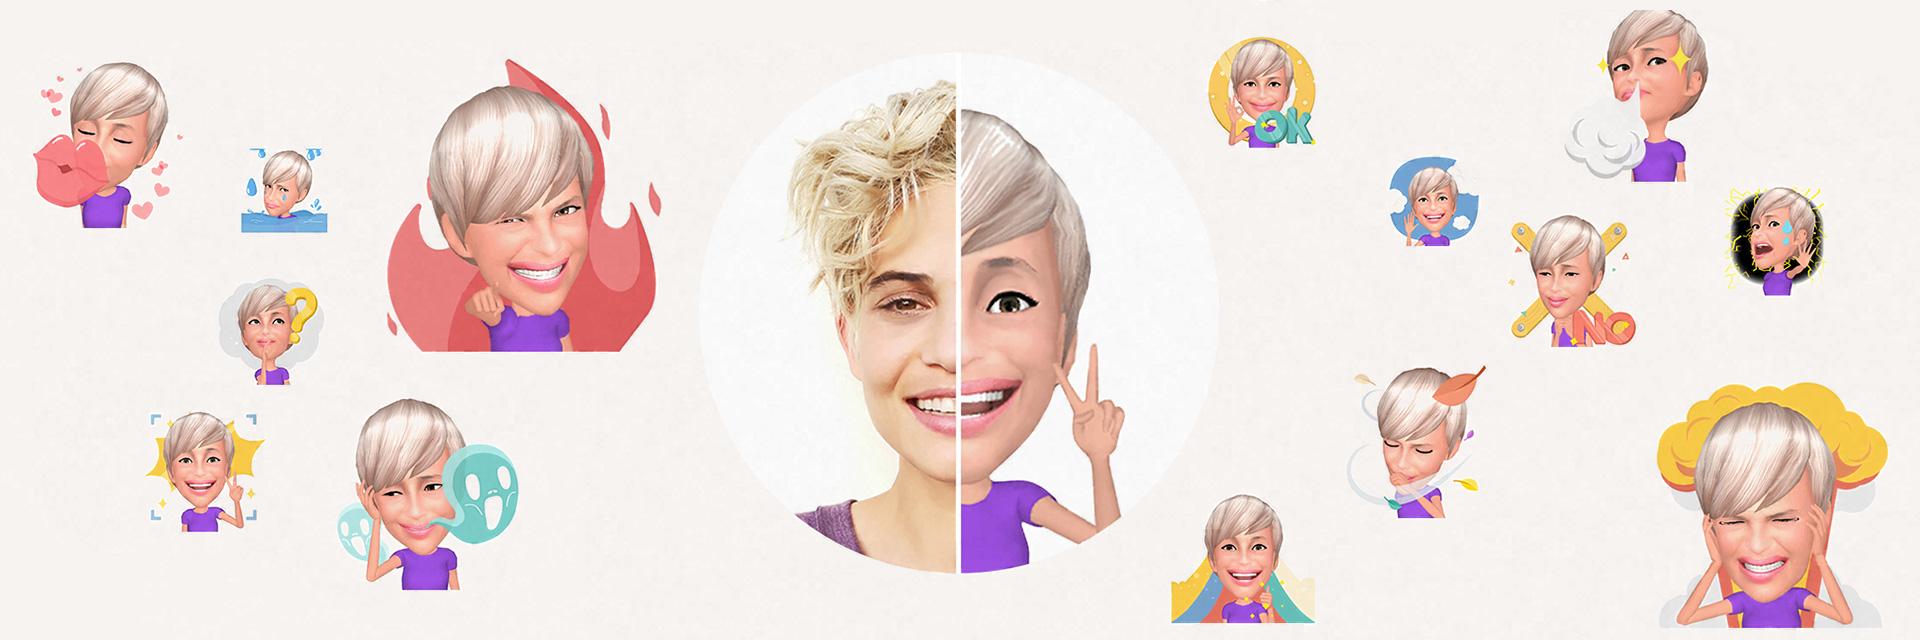 Samsung Star Launch My Emoji 1920px